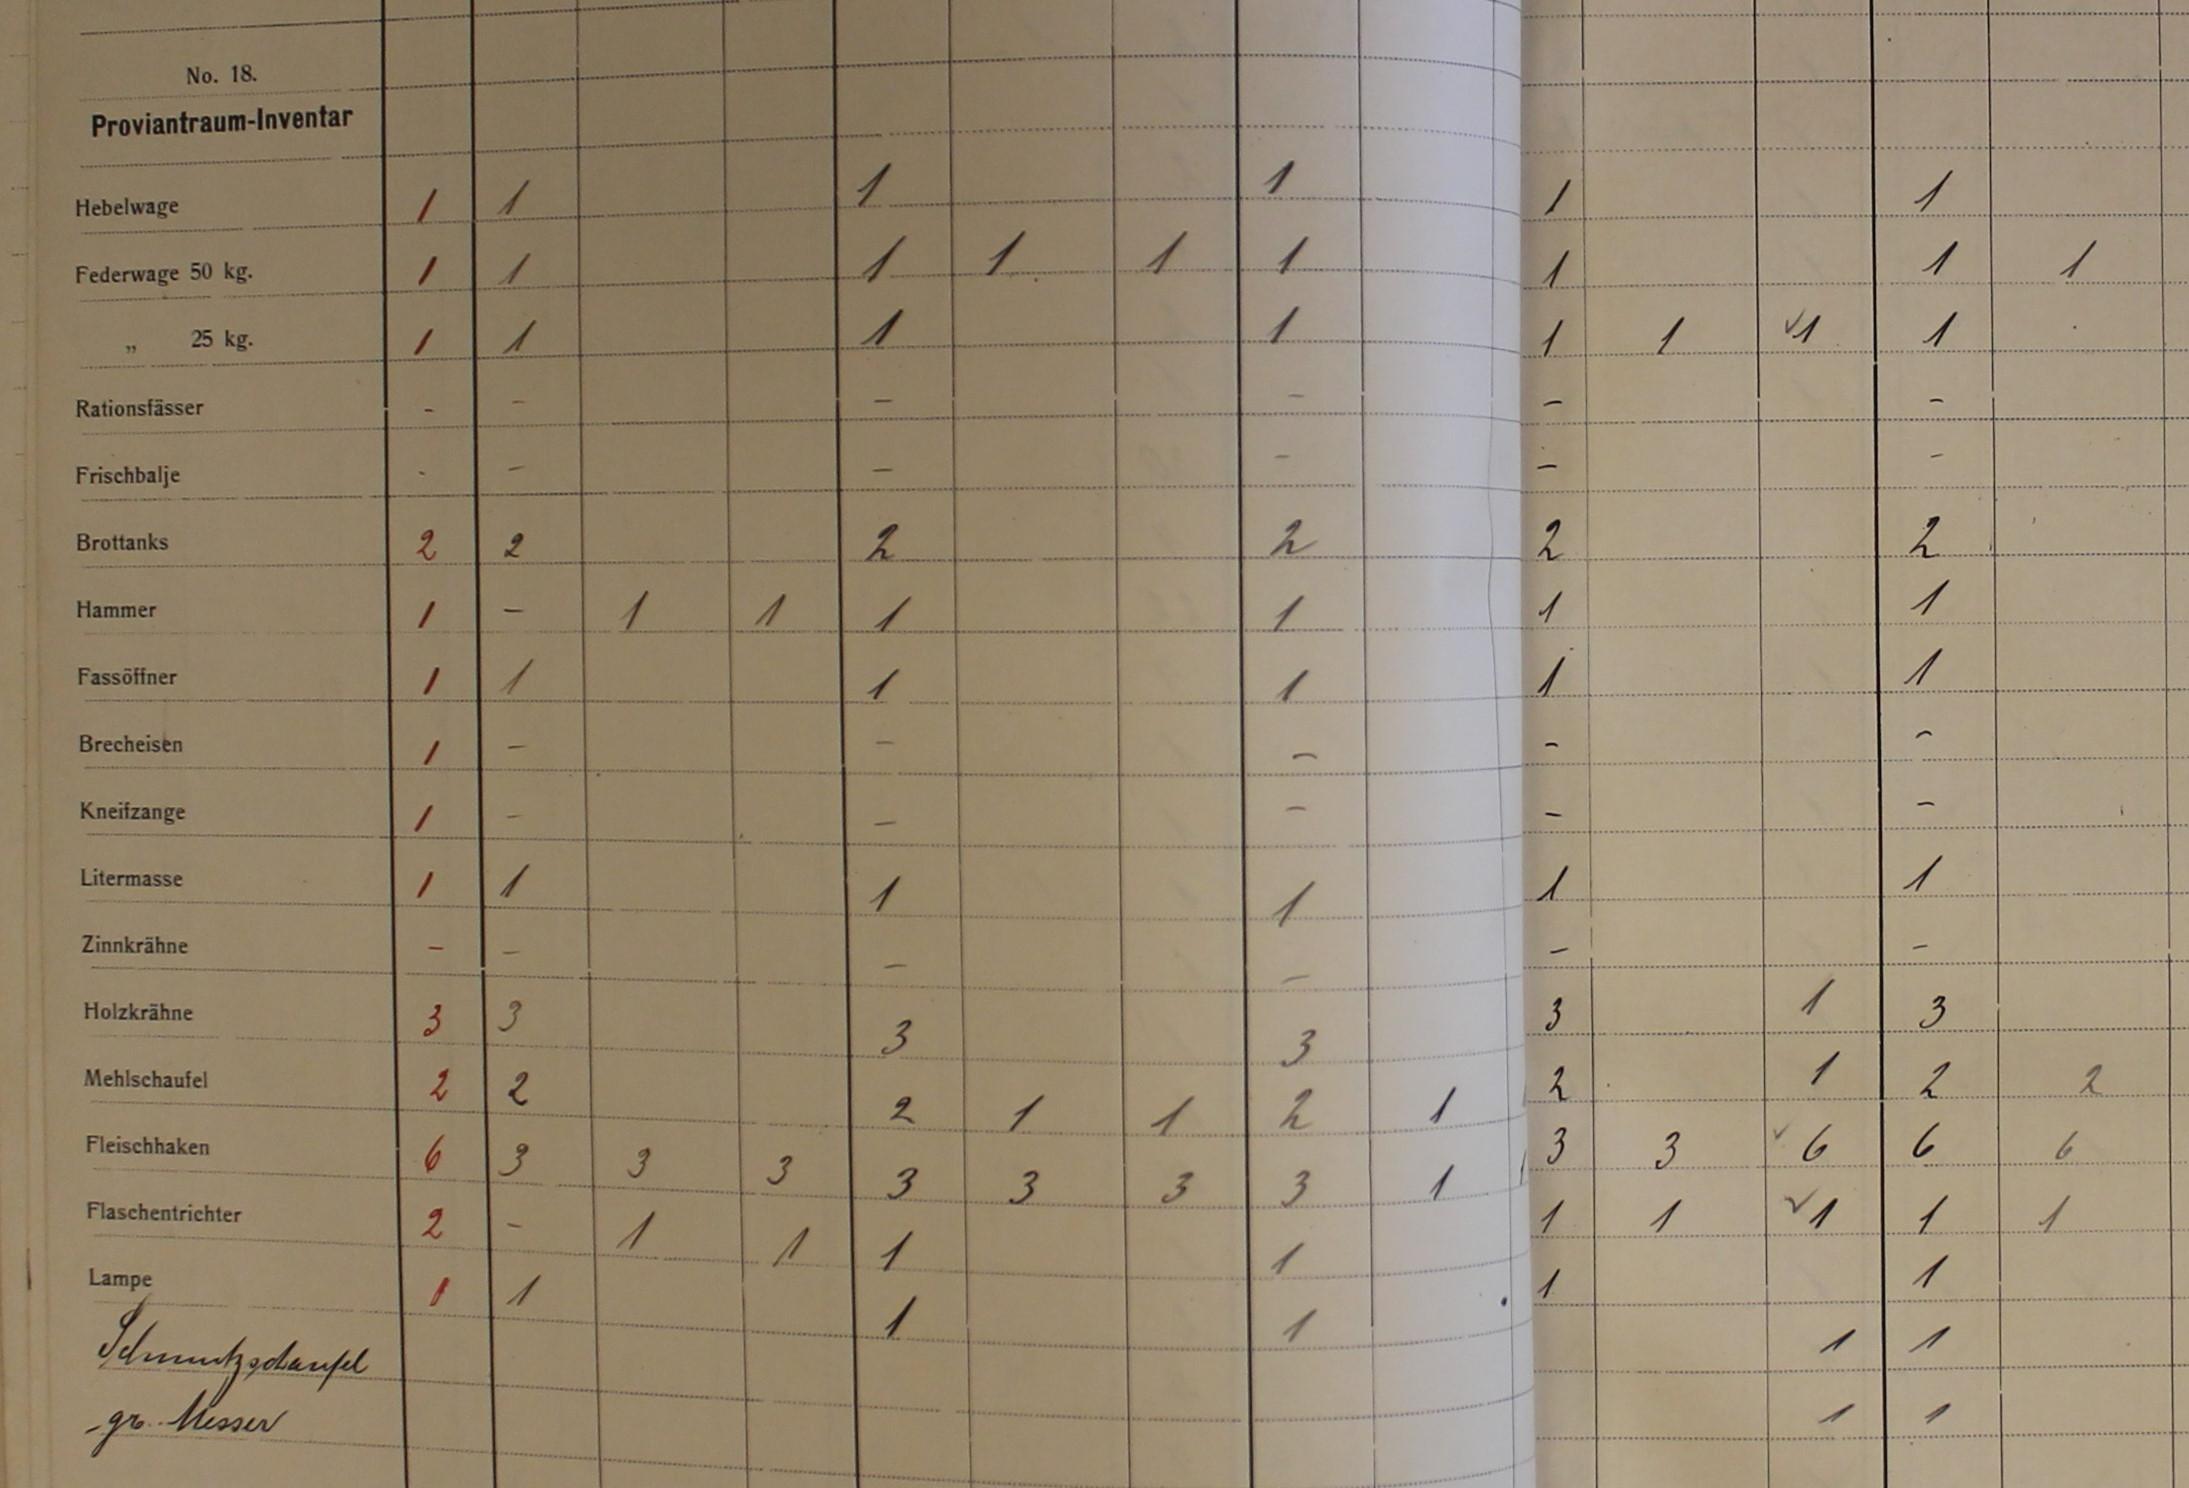 Inventory book, steam ship 1907